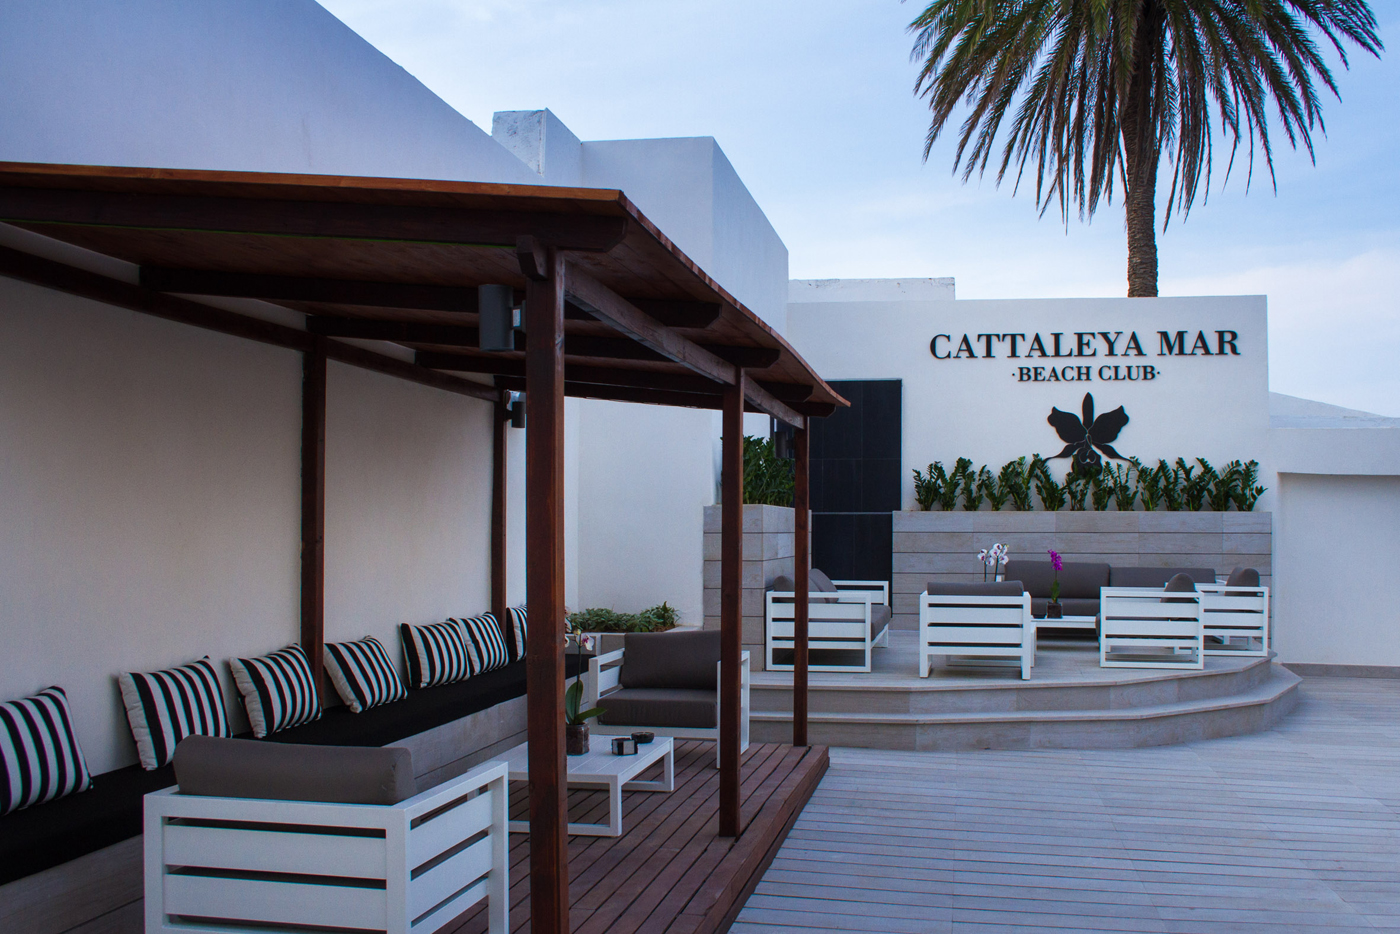 Cattaleya Mar, un nuevo Beach Club muy cerca de Valencia